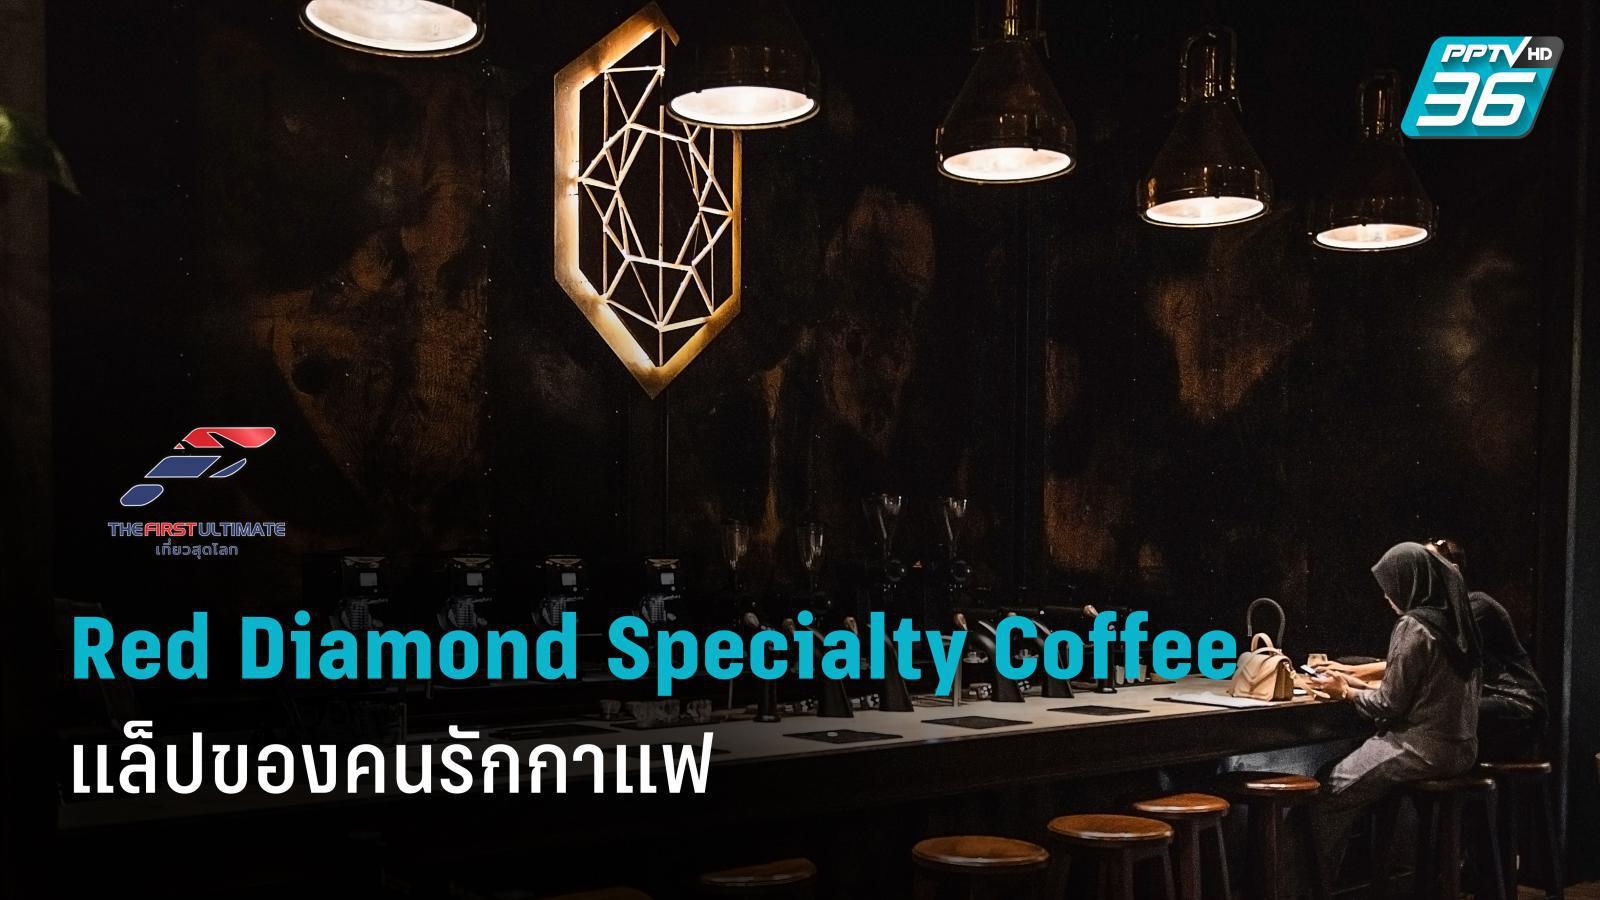 Red Diamond Specialty Coffee แล็ปของคนรักกาแฟ